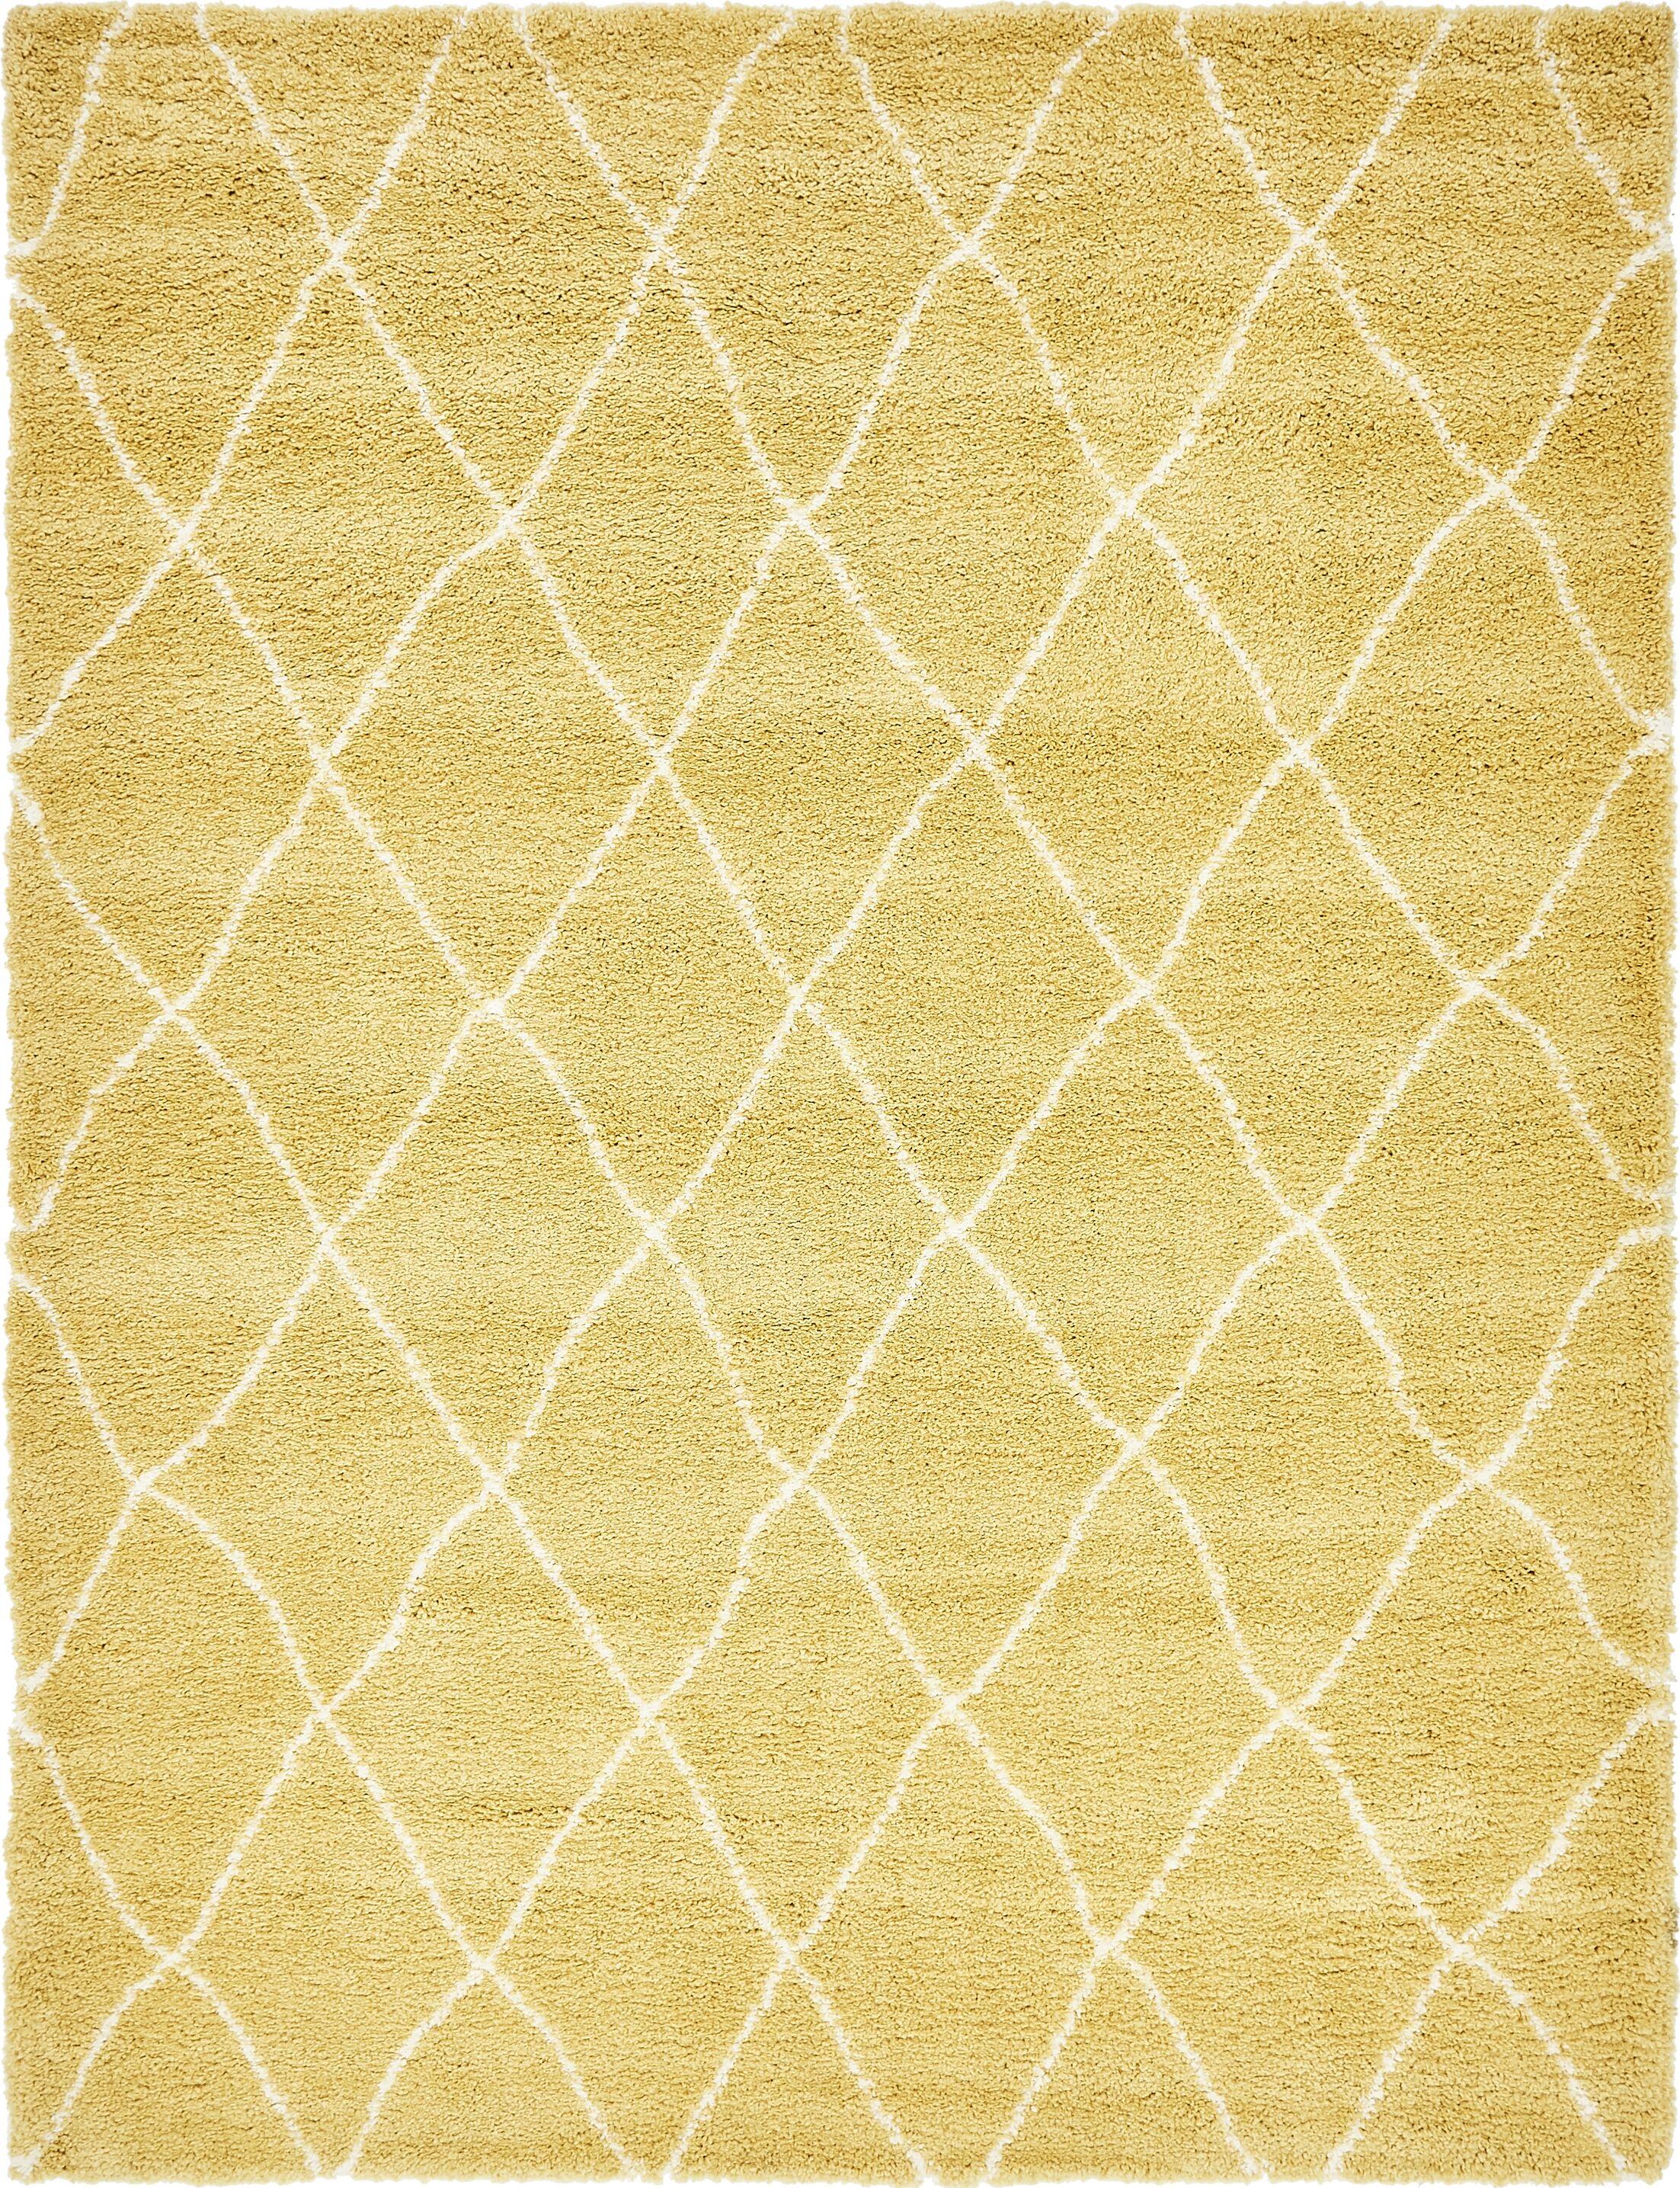 Cynthiana Yellow Area Rug Rug Size: Rectangle 9' x 12'